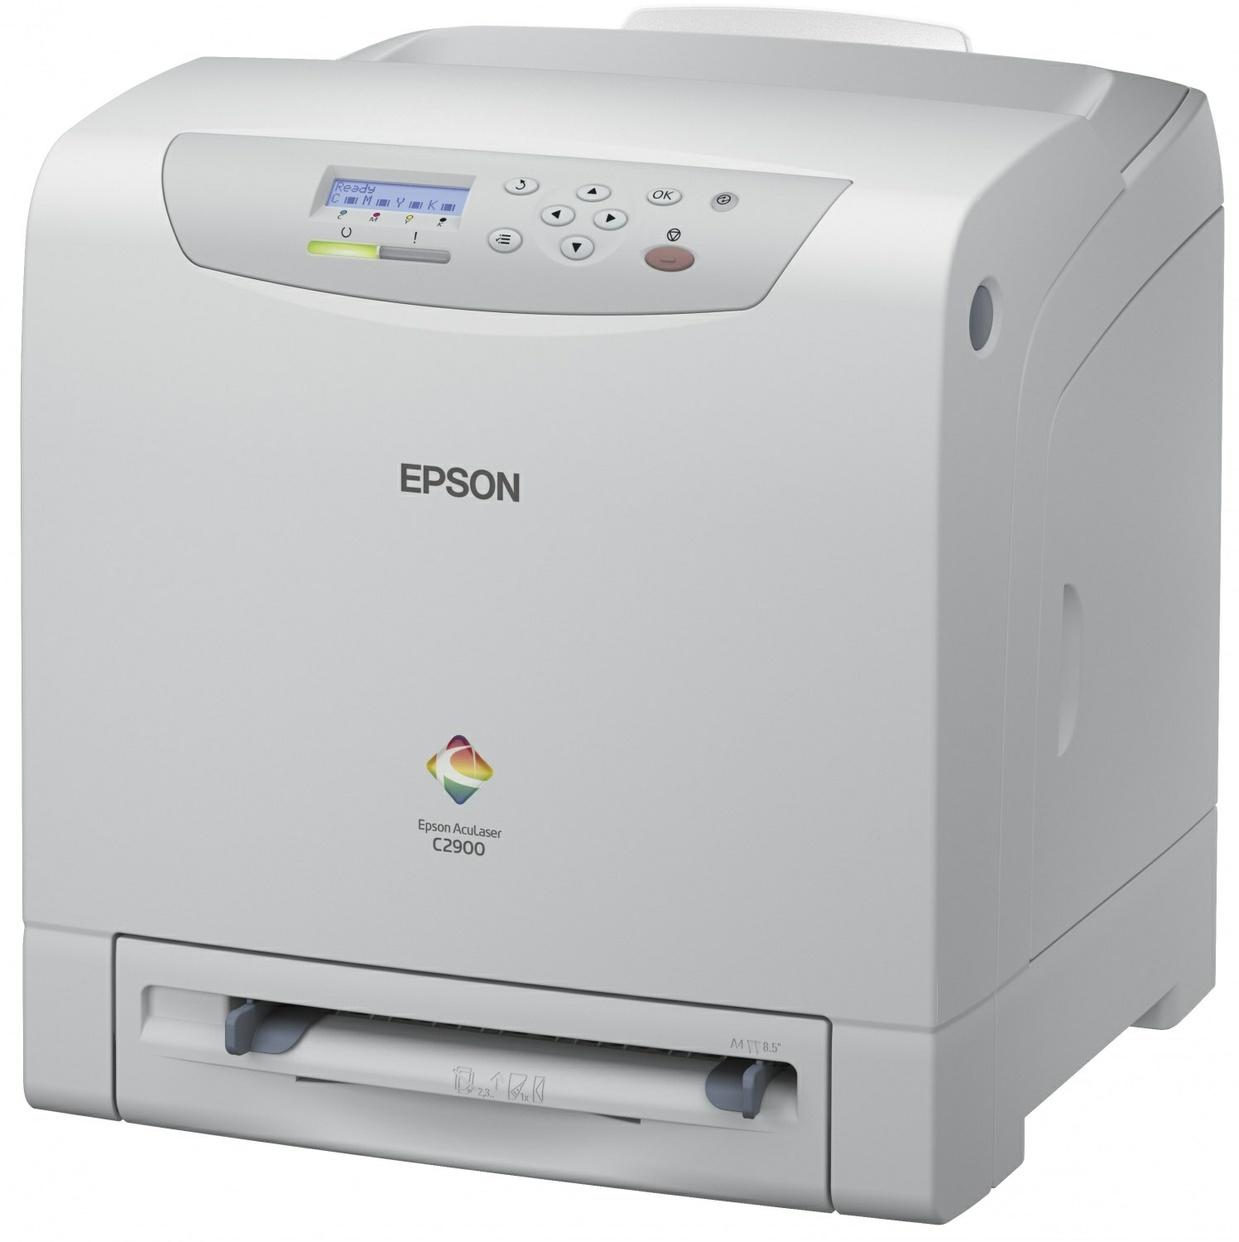 Epson AcuLaser C2900N Laser Printer Service Repair Manual